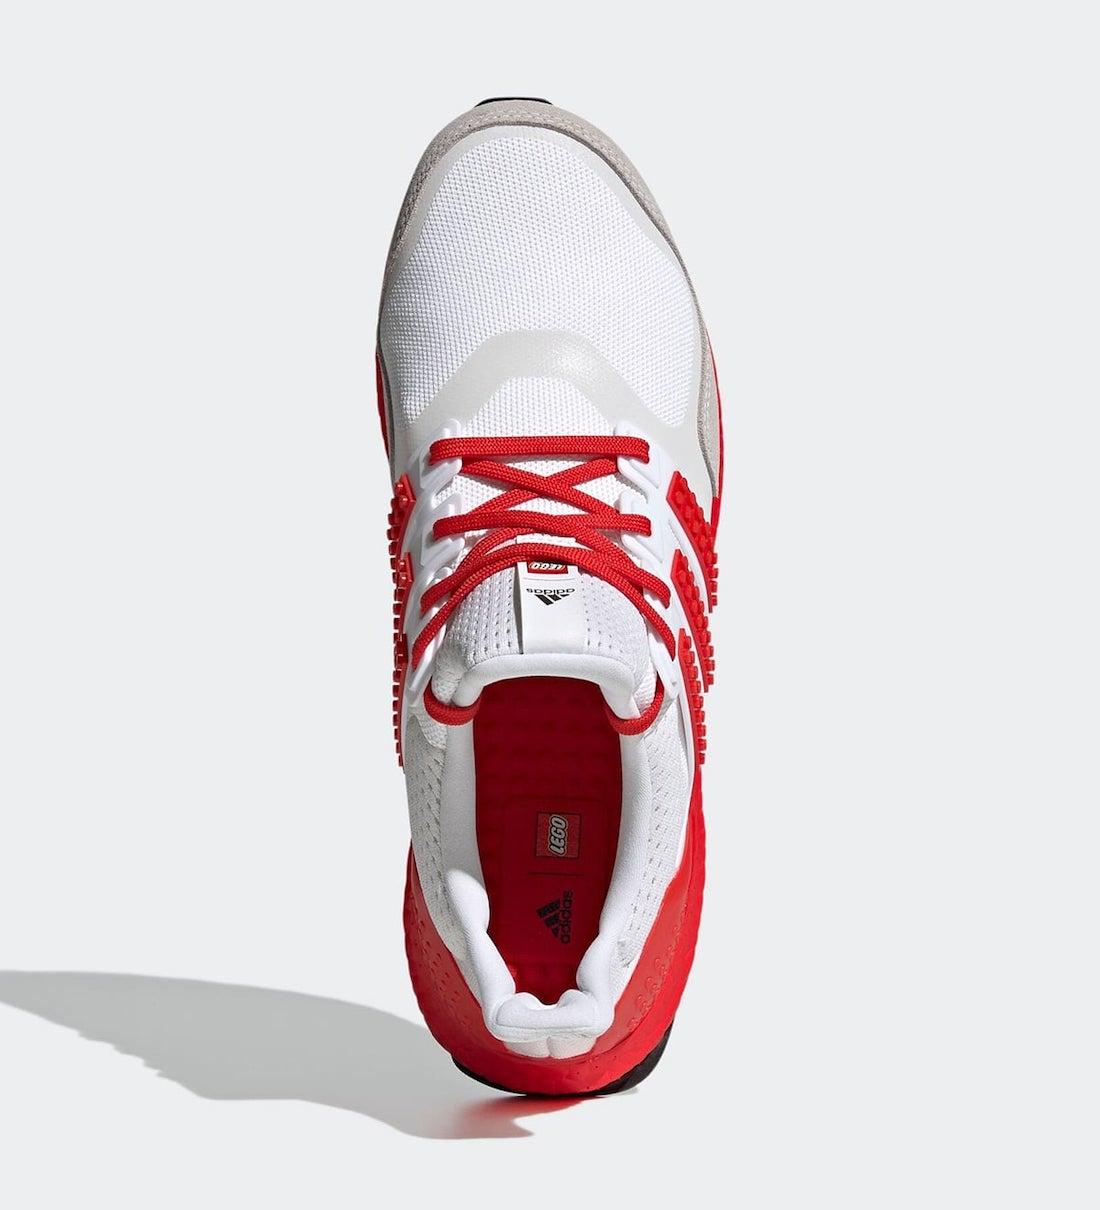 Ultra Boost DNA, Ultra Boost, Boost, Adidas Ultra Boost, Adidas